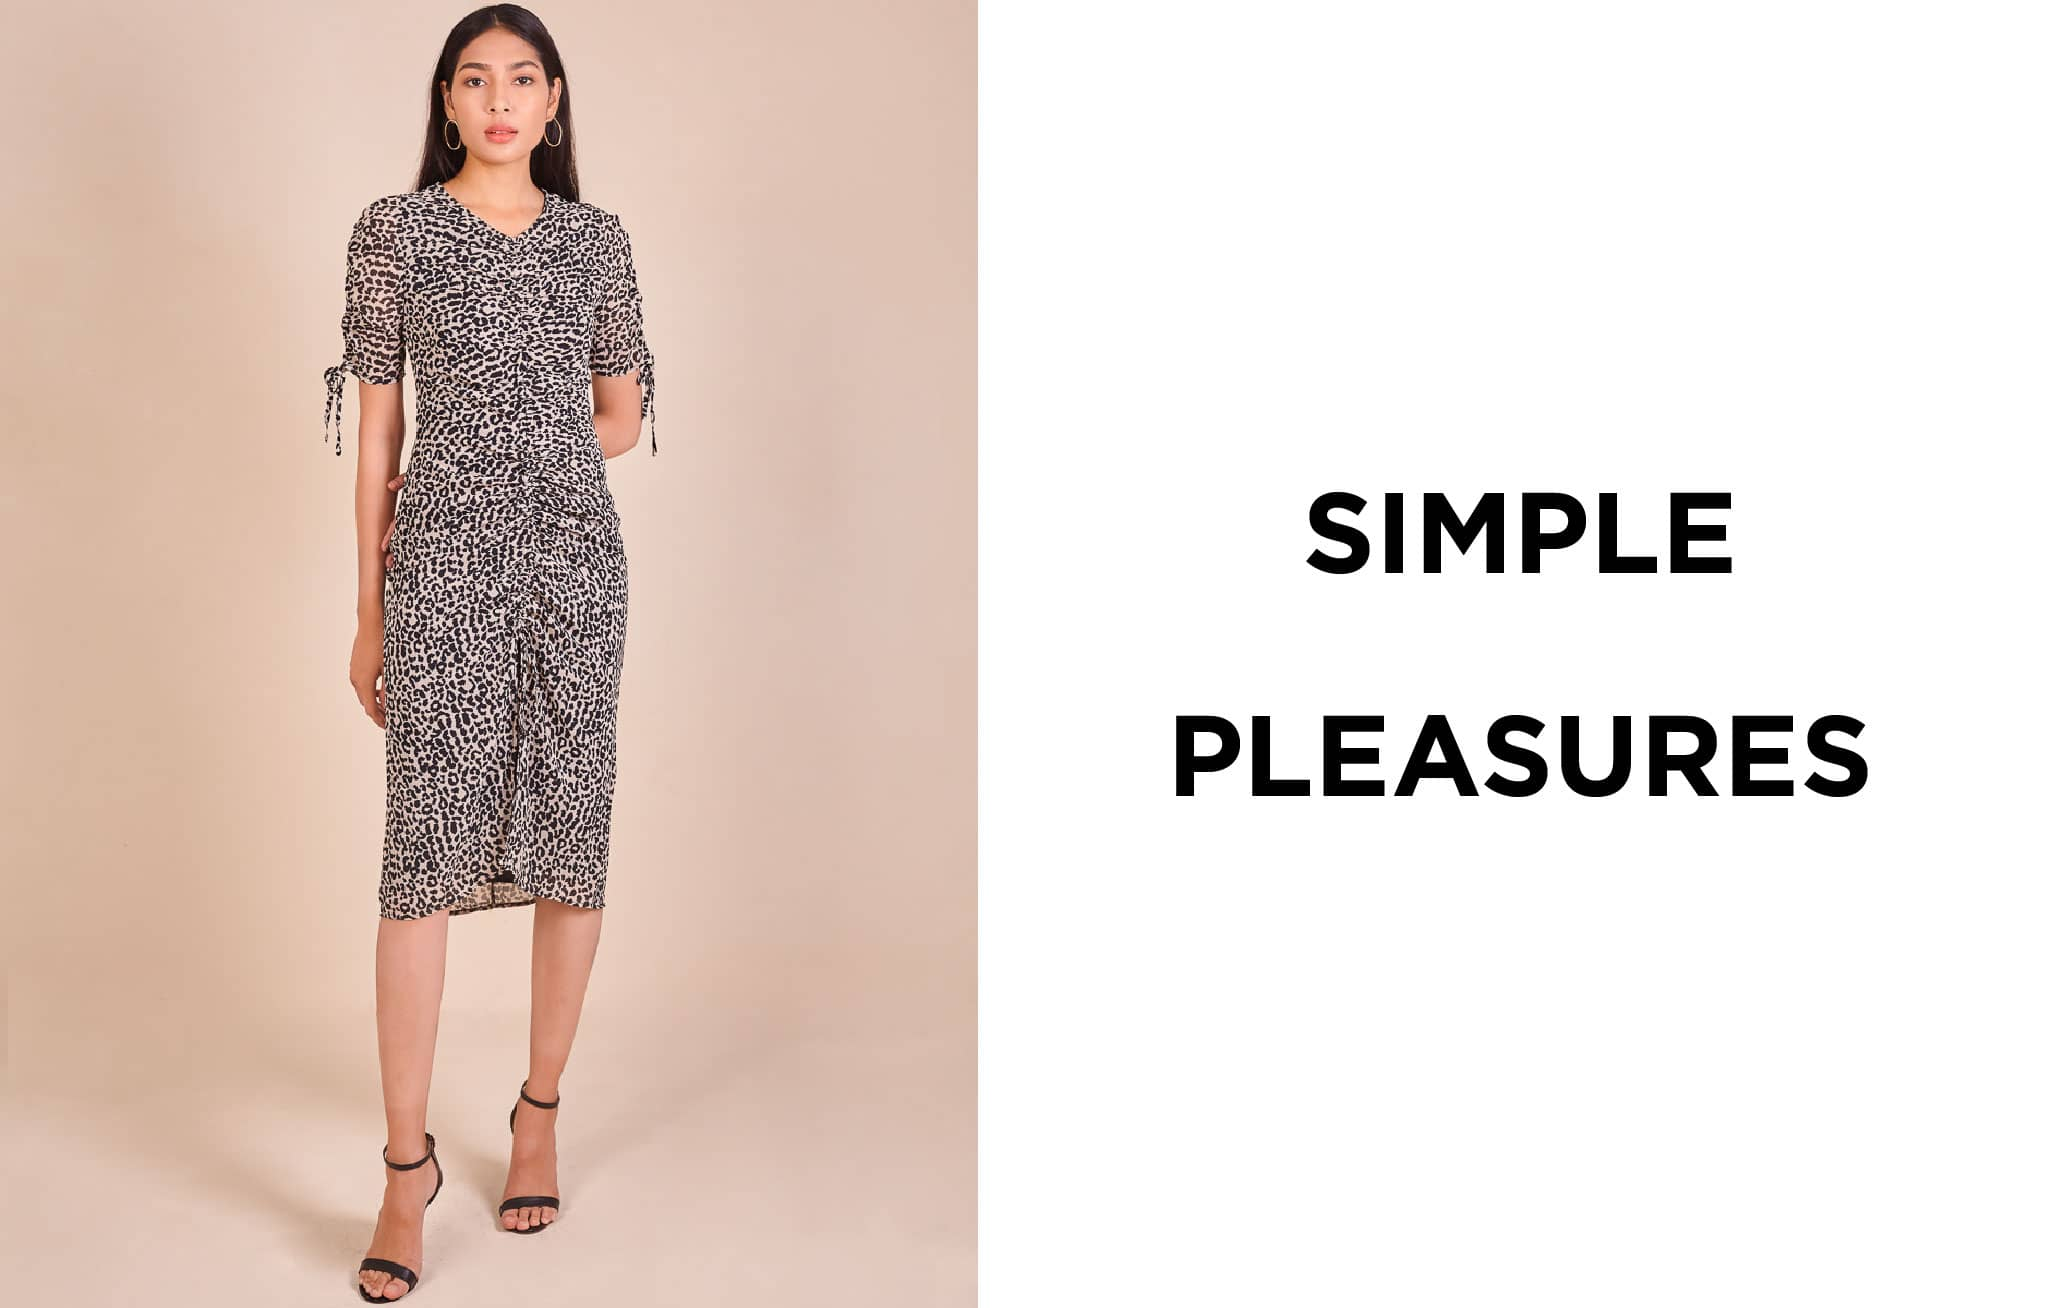 Ruched Leopard Print Chiffon Dress